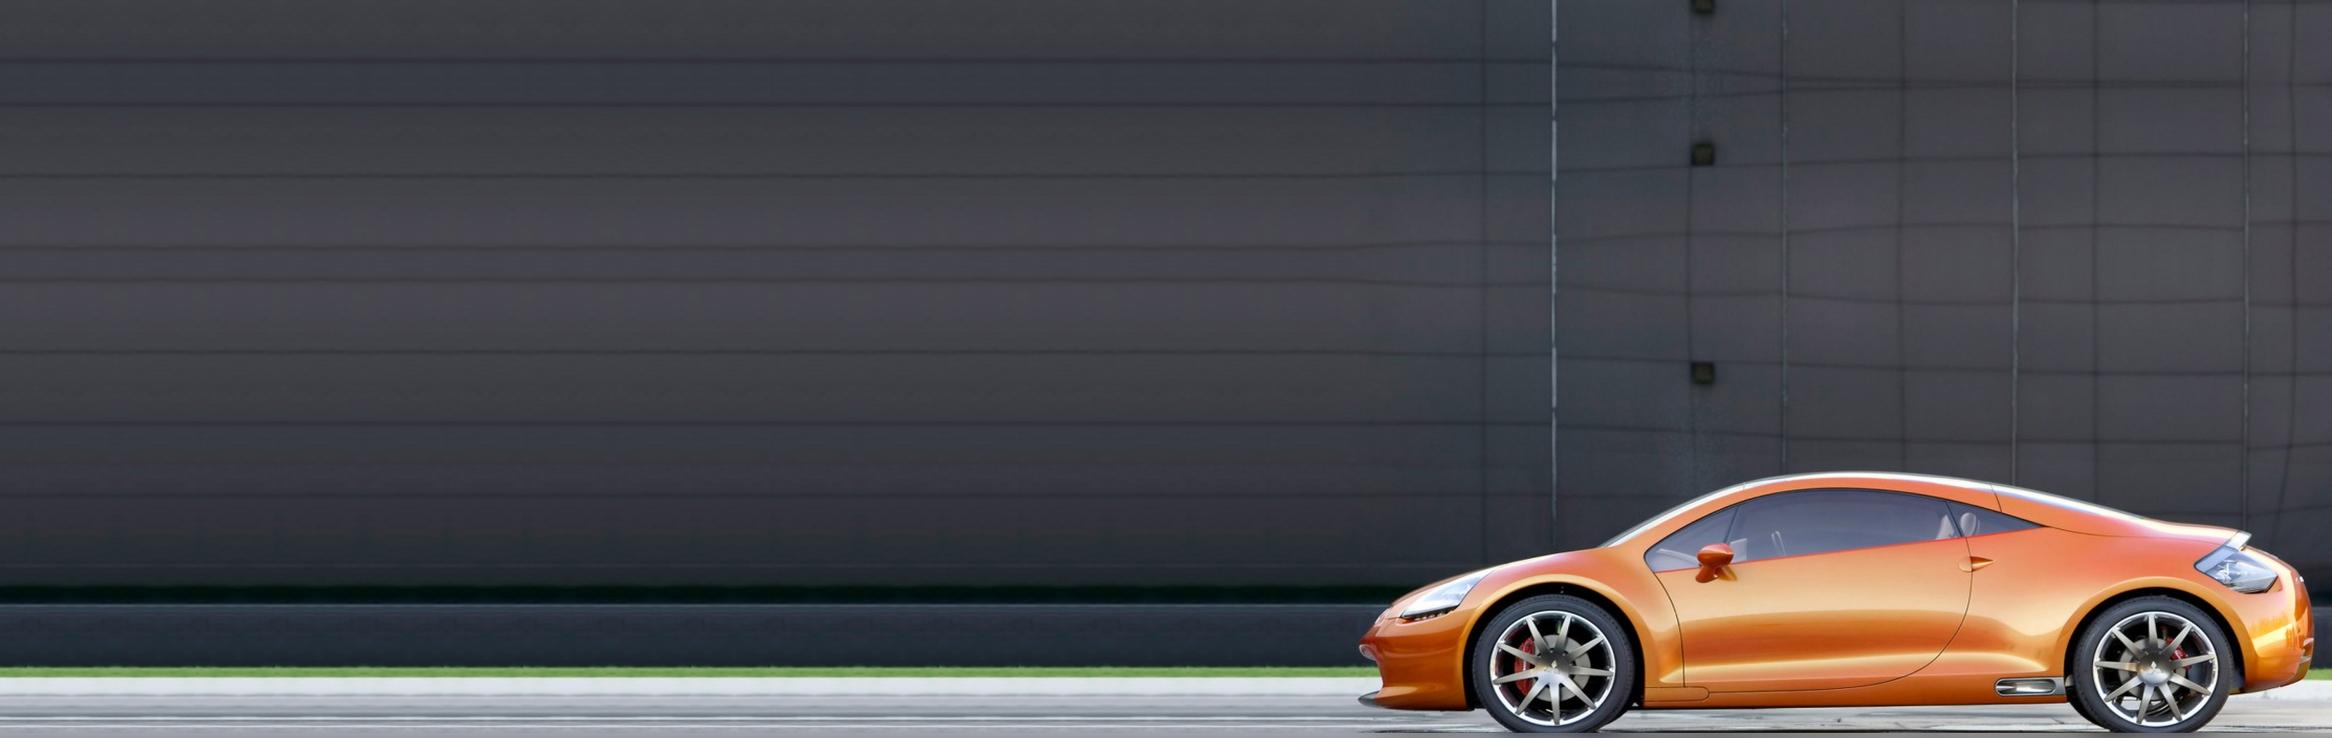 Veille Automobile